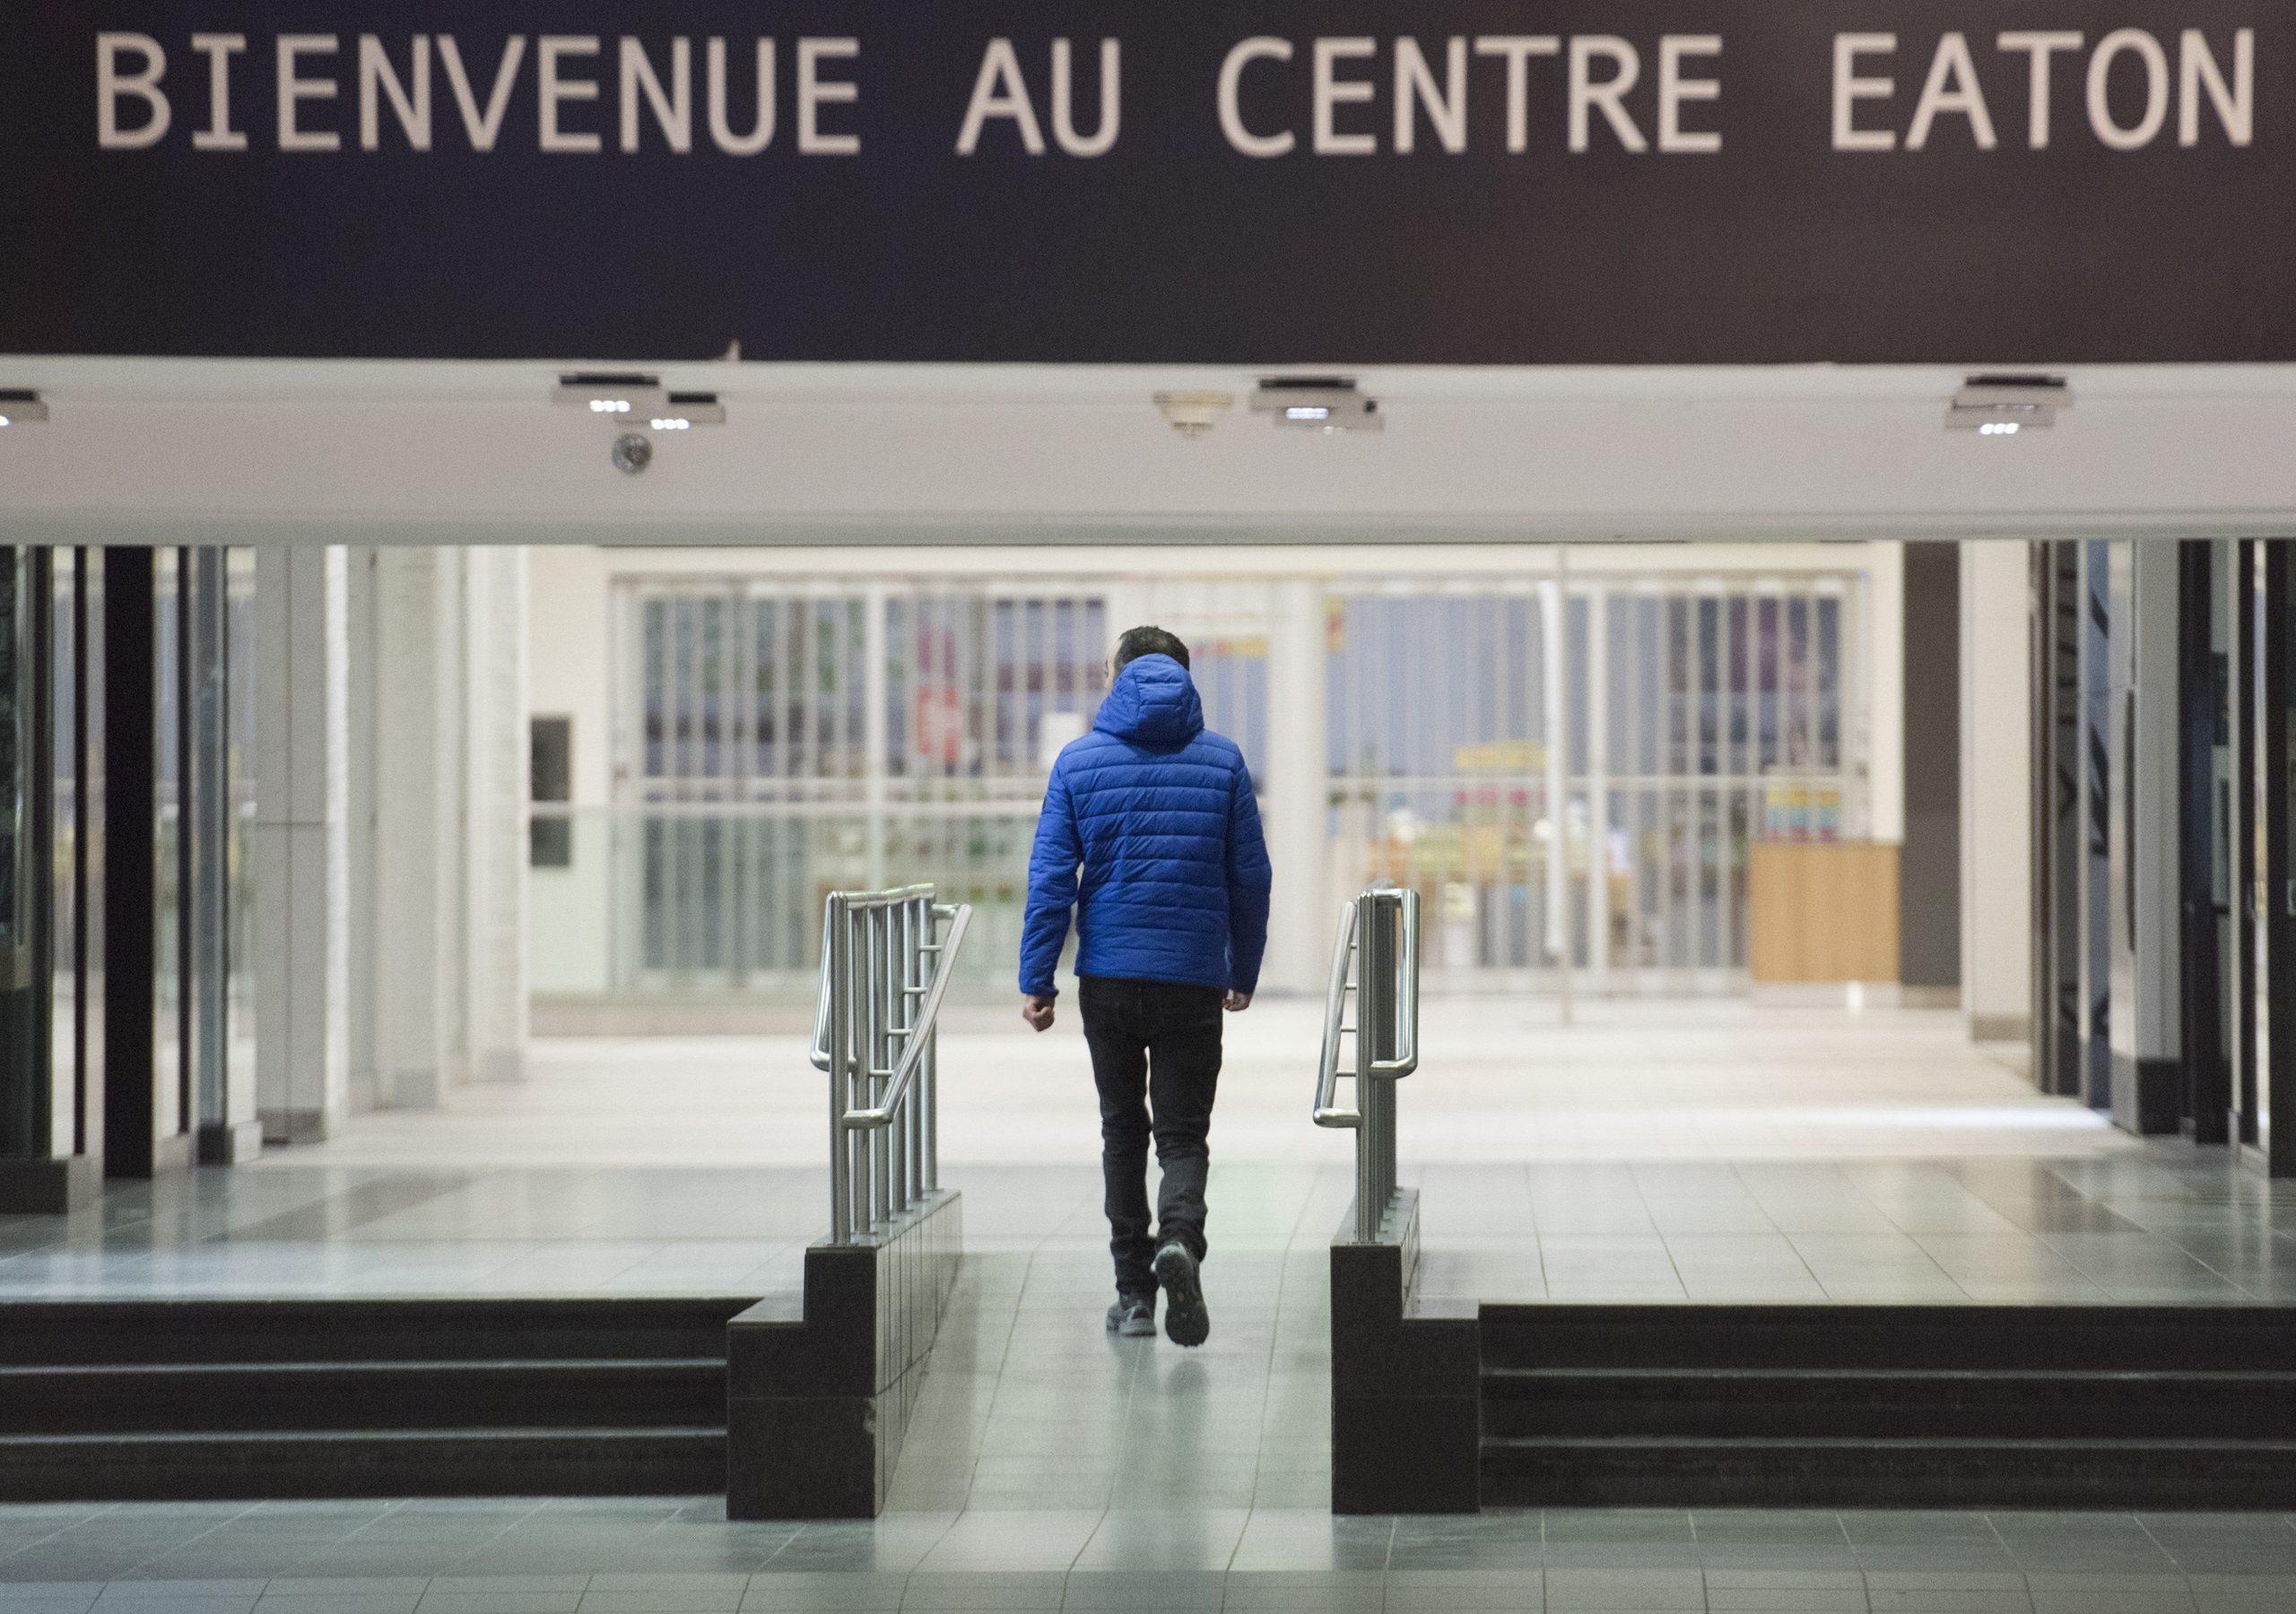 Stricter measures take effect in Quebec in bid to slow coronavirus